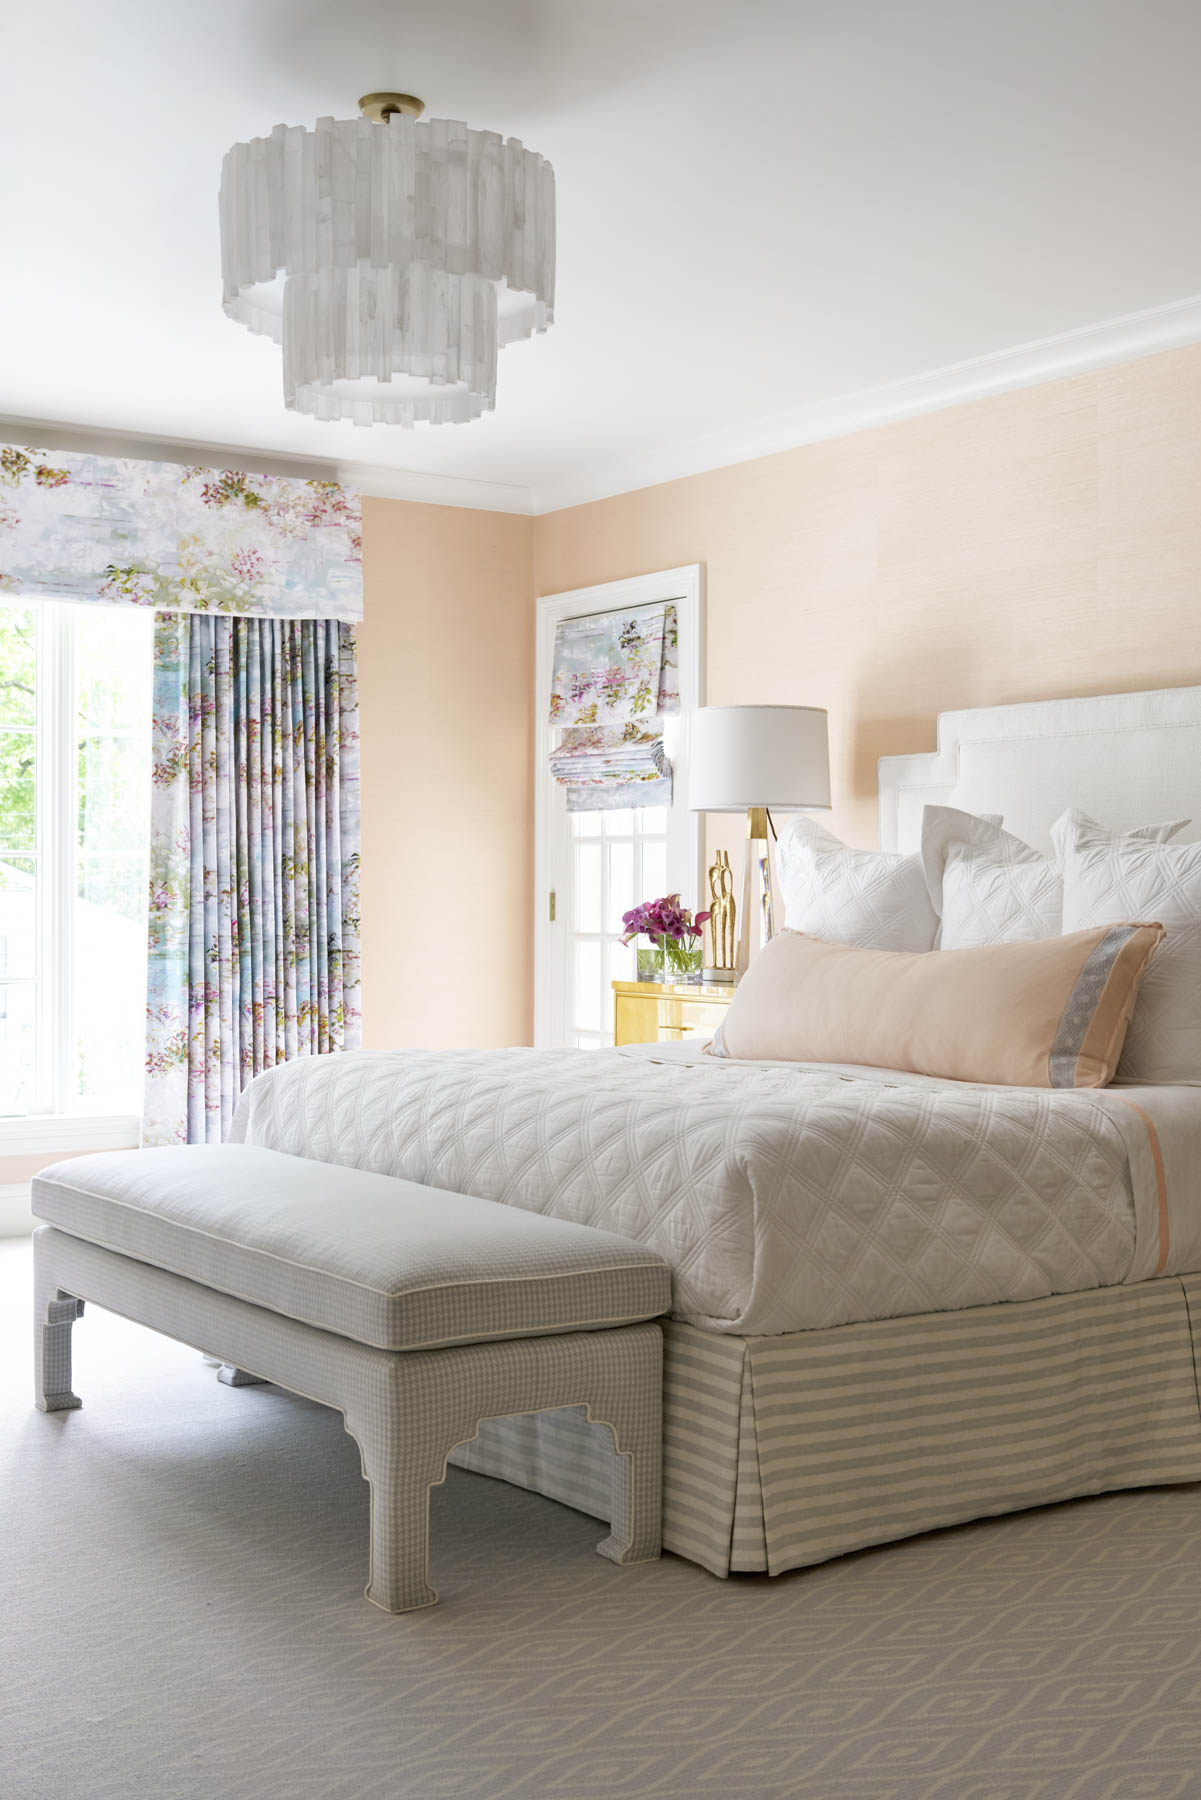 delightful dwelling collins interiors. Black Bedroom Furniture Sets. Home Design Ideas